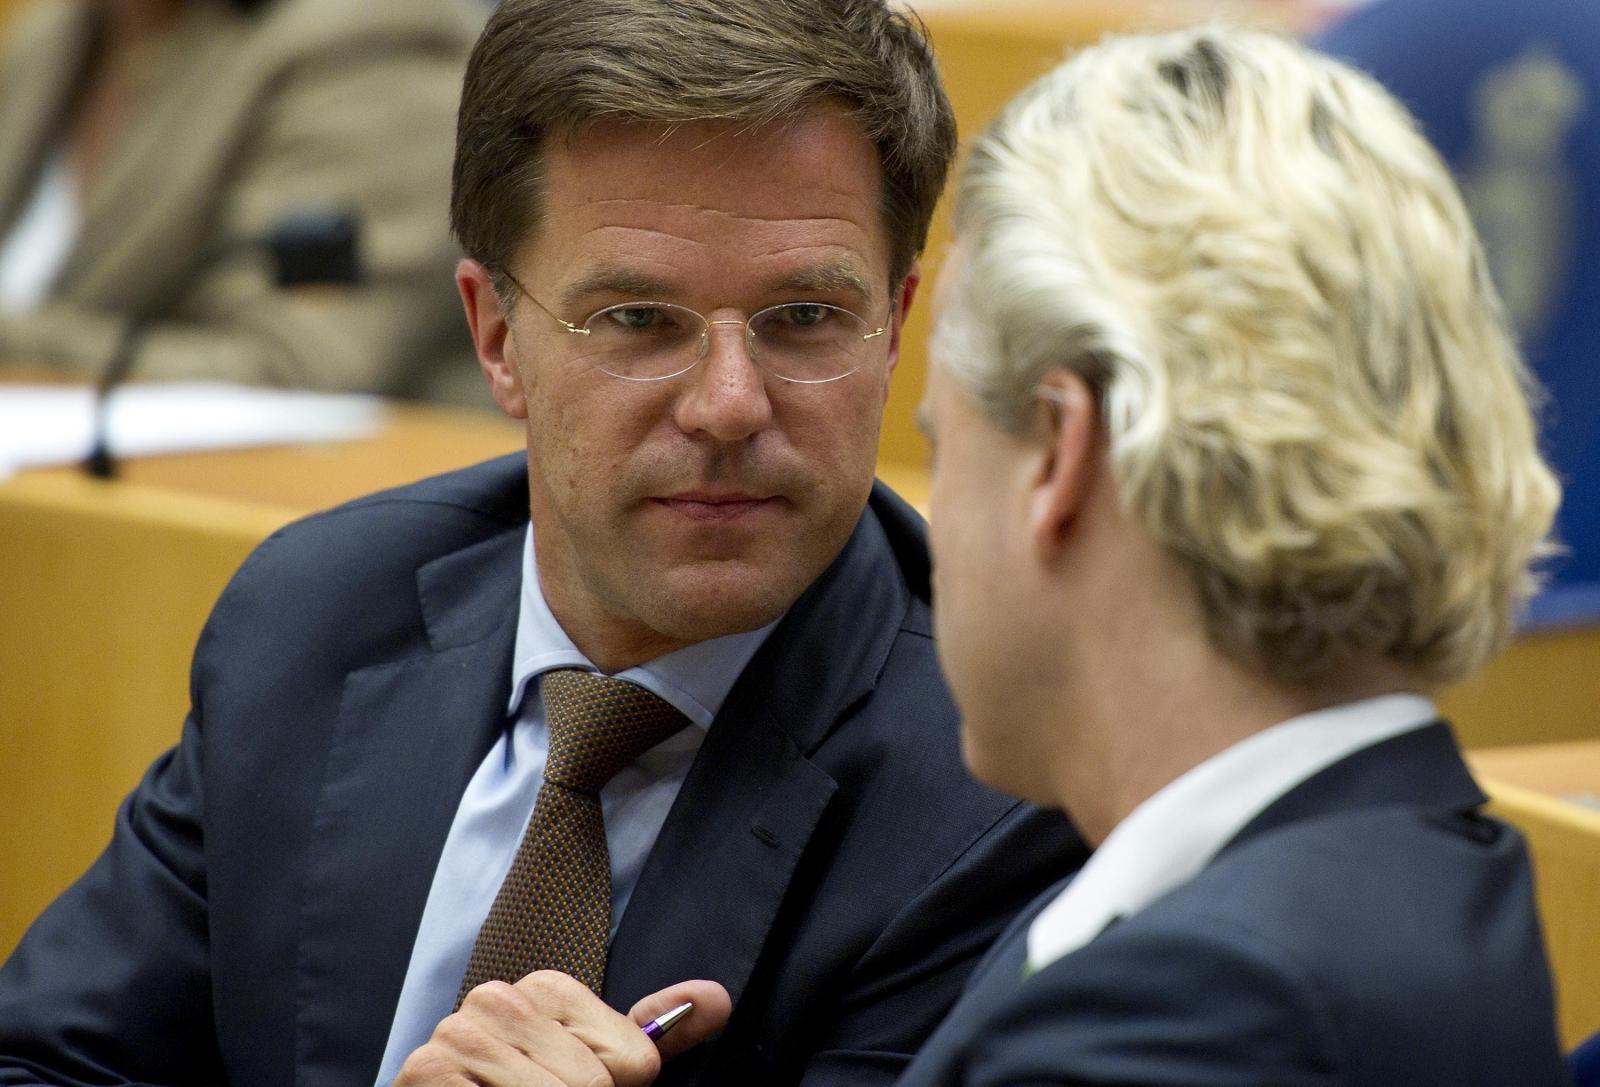 Mark Rutte and Geert Wilders